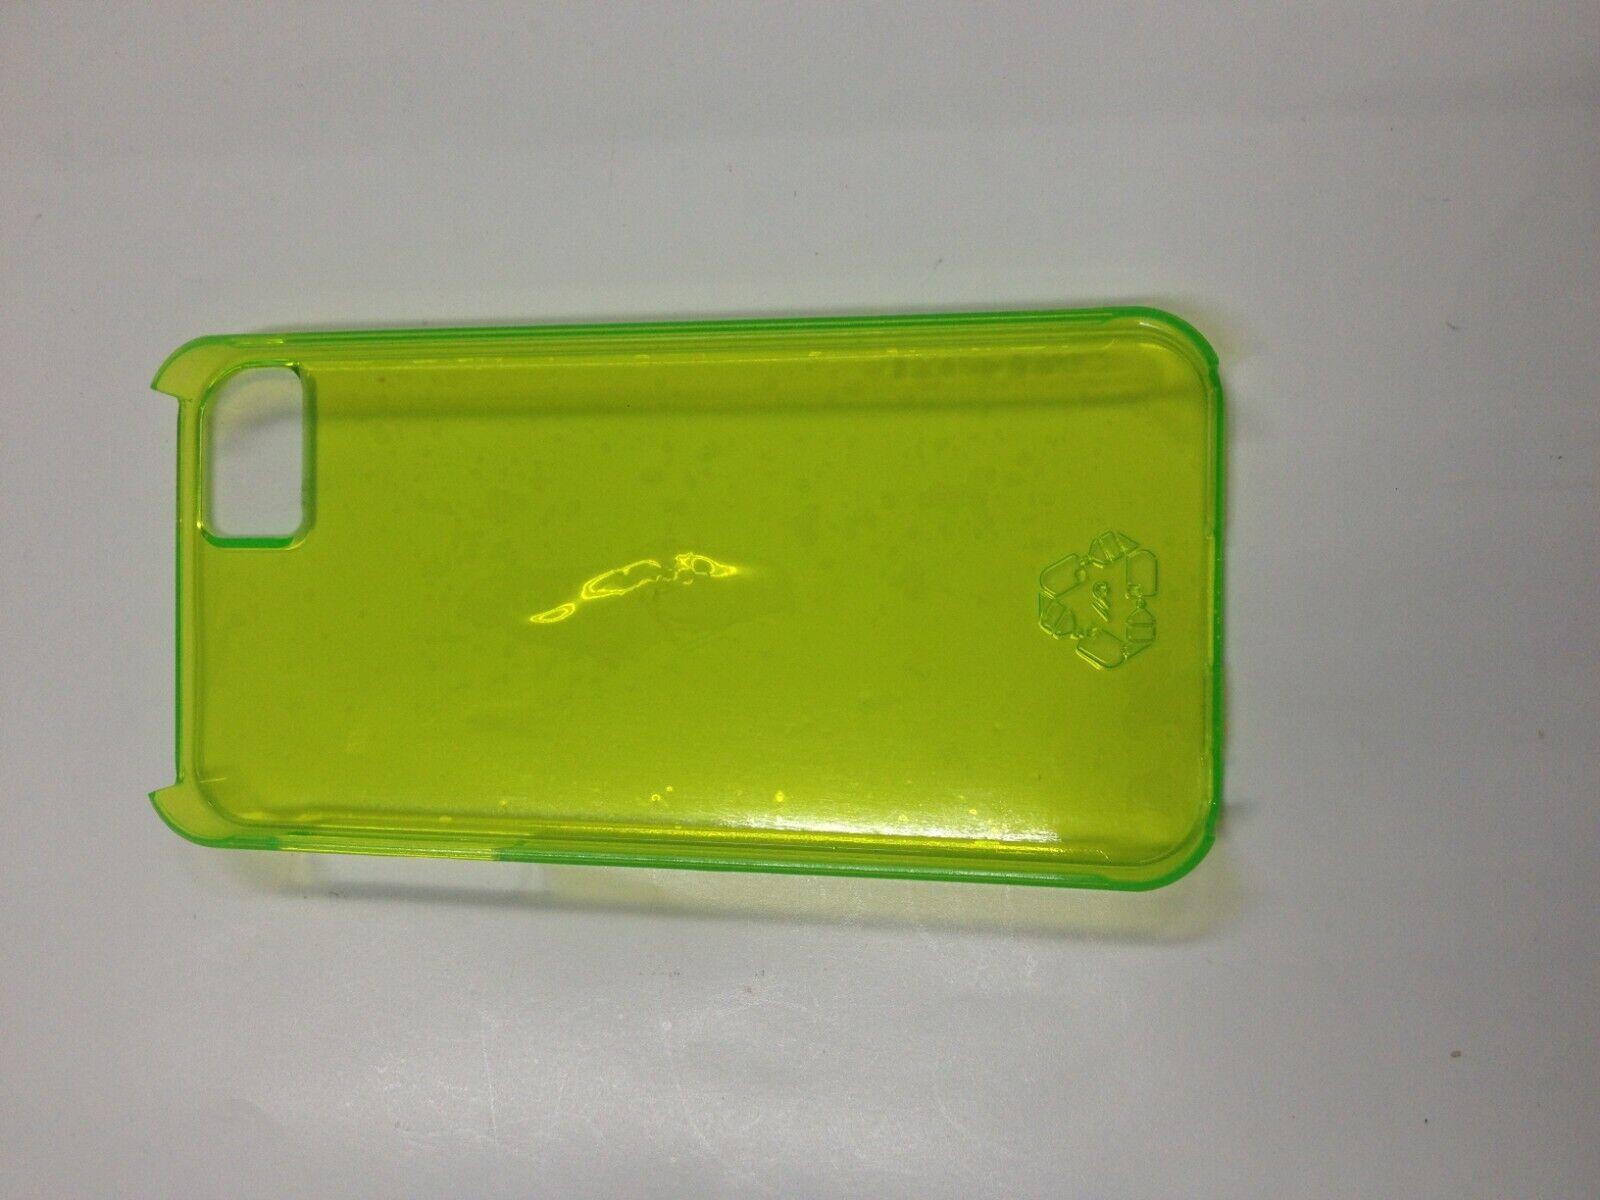 CASE-MATE RPET ULTRA SLIM TRANSPARENT BACK COVER - APPLE iPHONE 5  - GREEN-